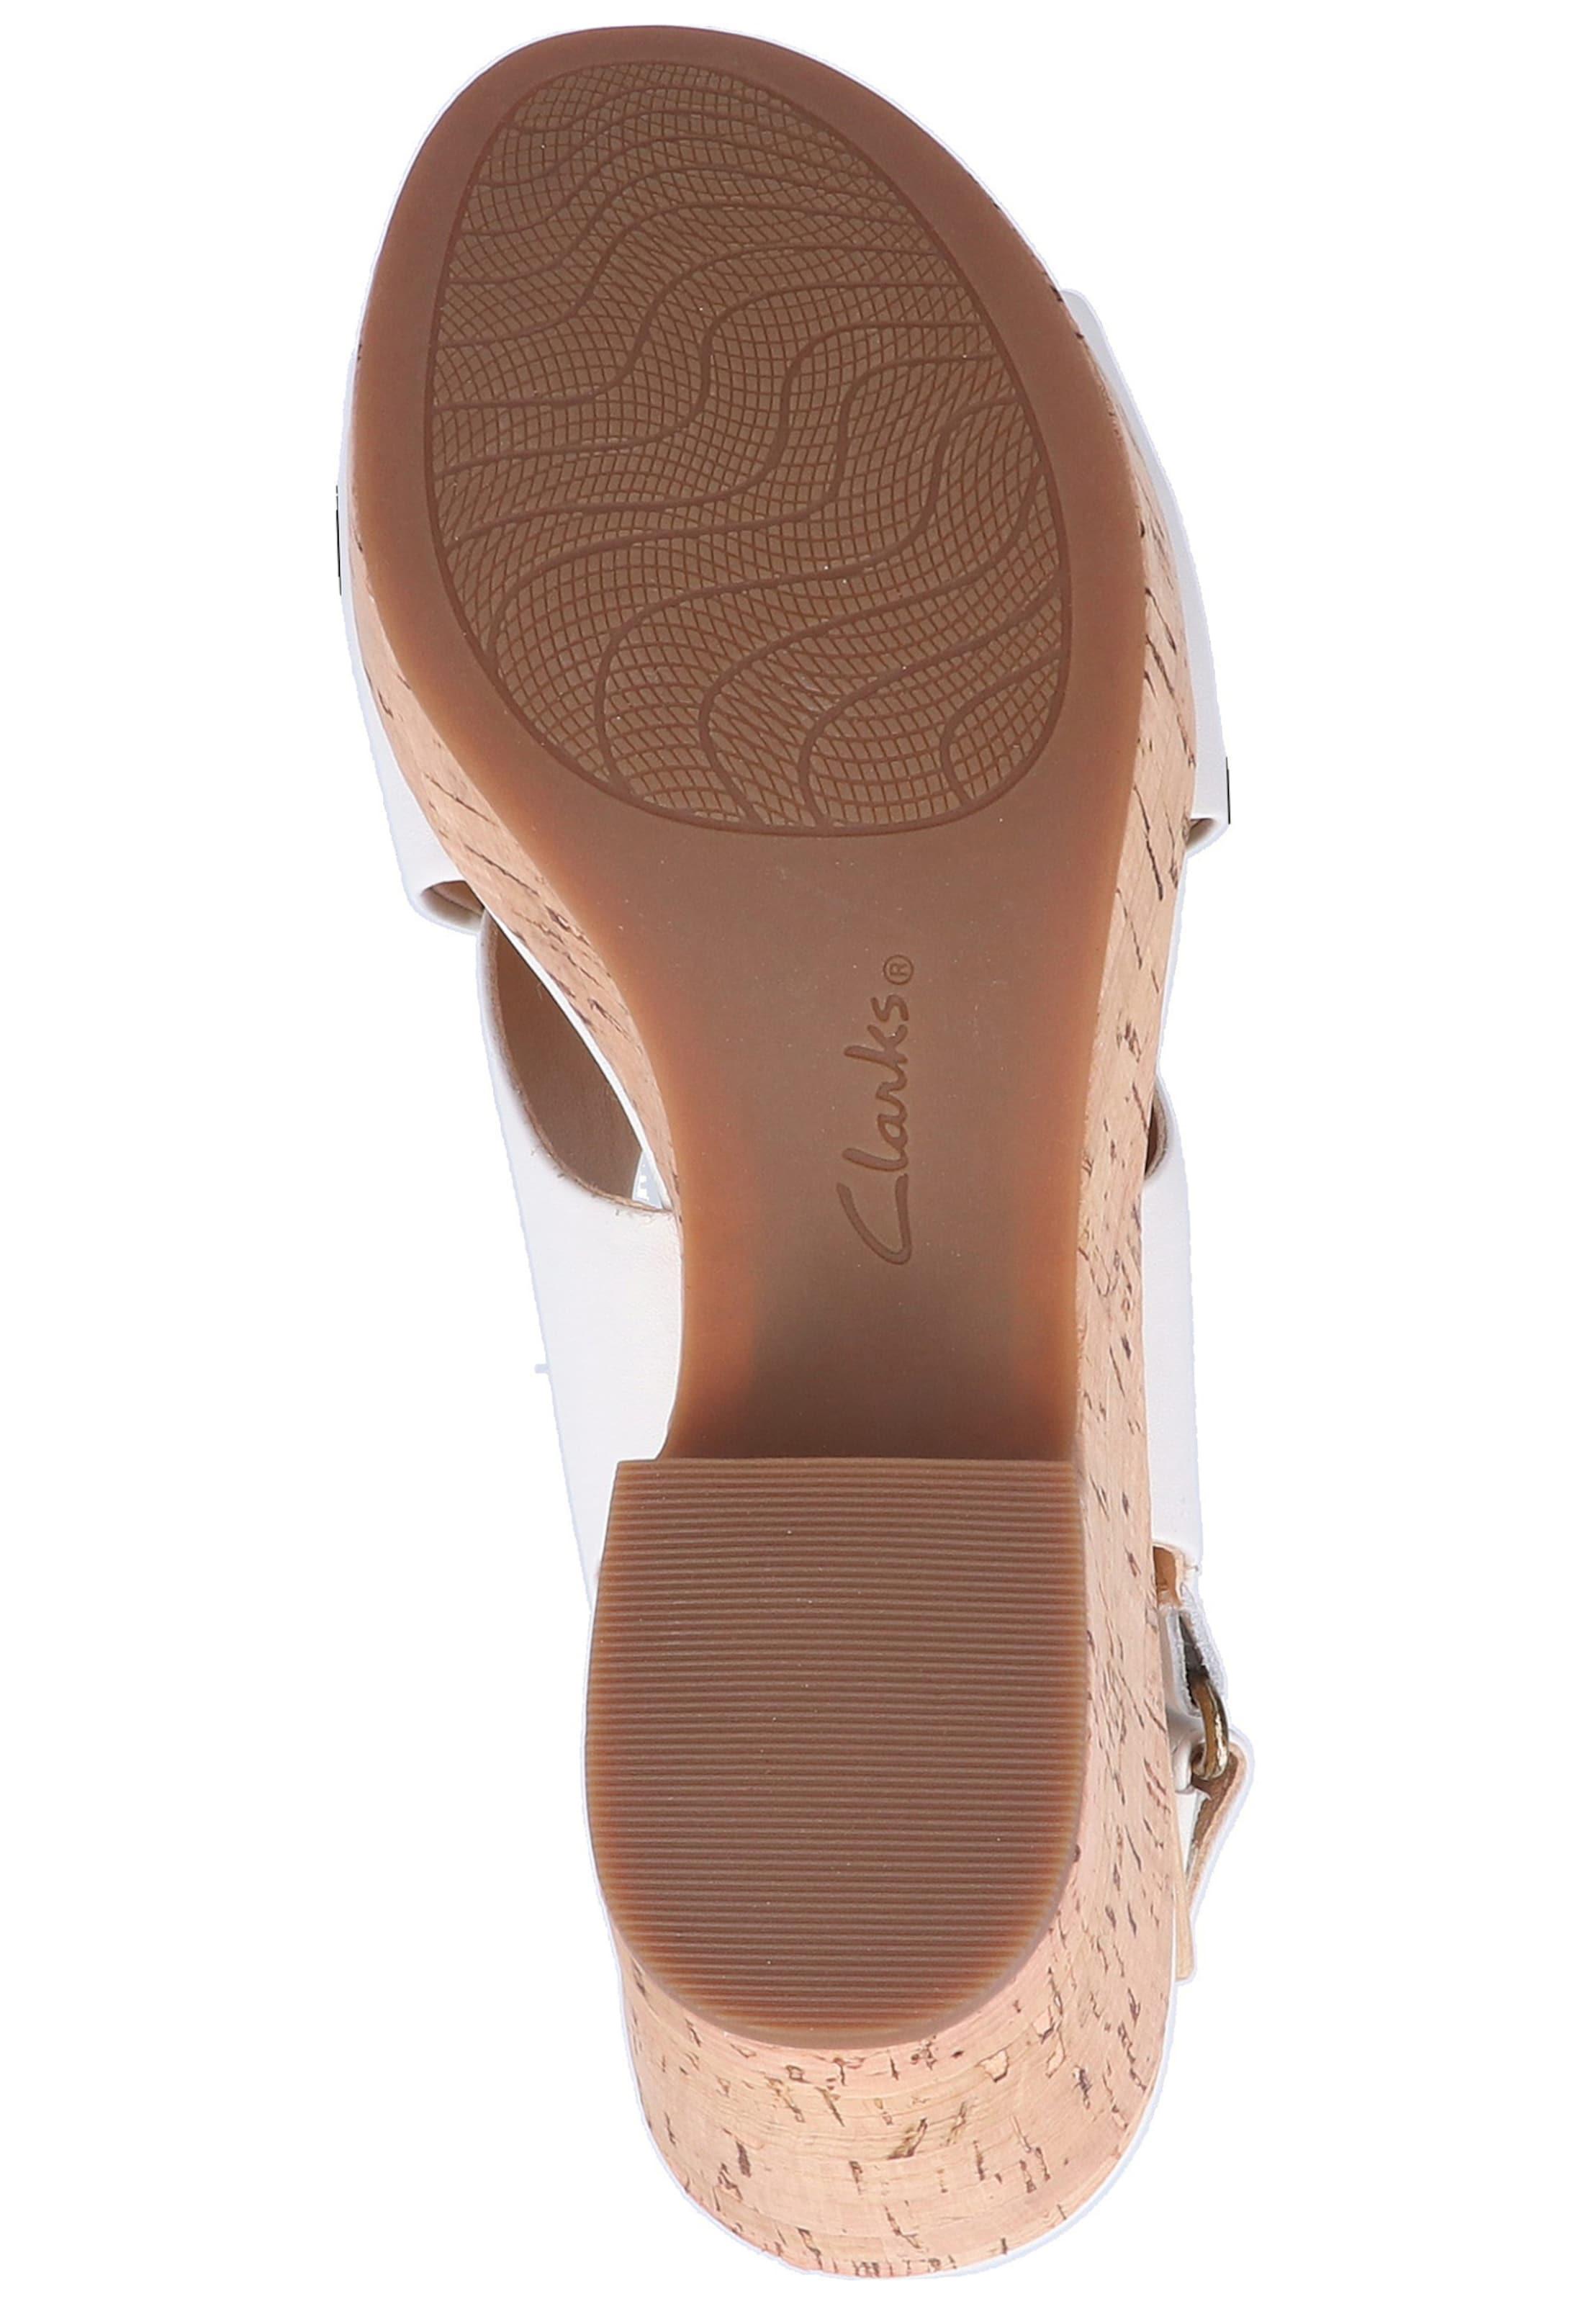 Clarks In Sandalen Clarks Sandalen In BraunWeiß v8wOm0nN